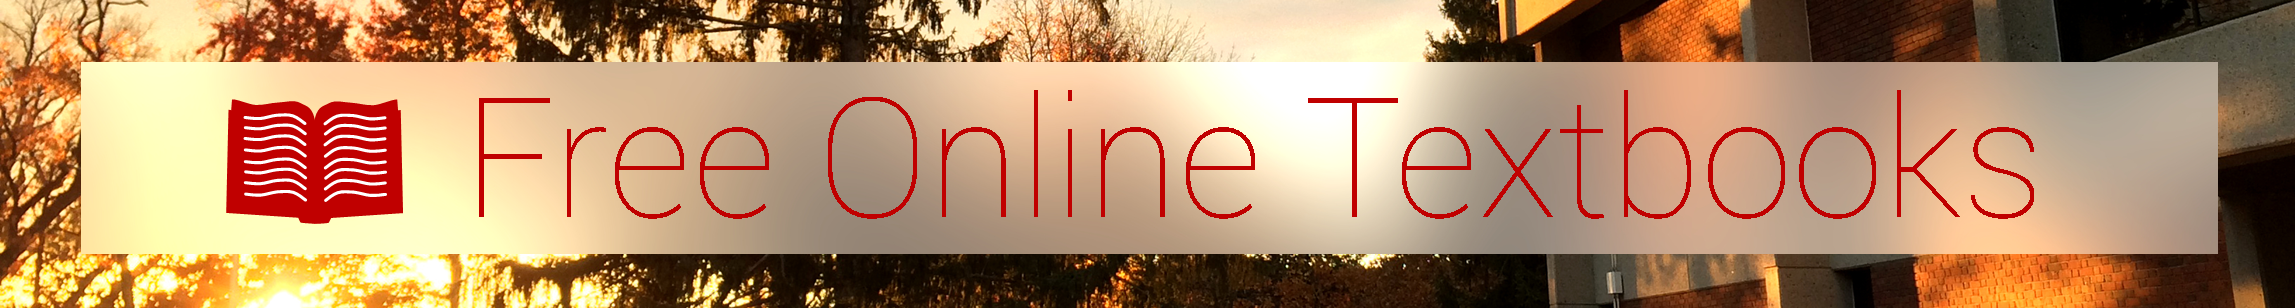 Free Online Textbooks